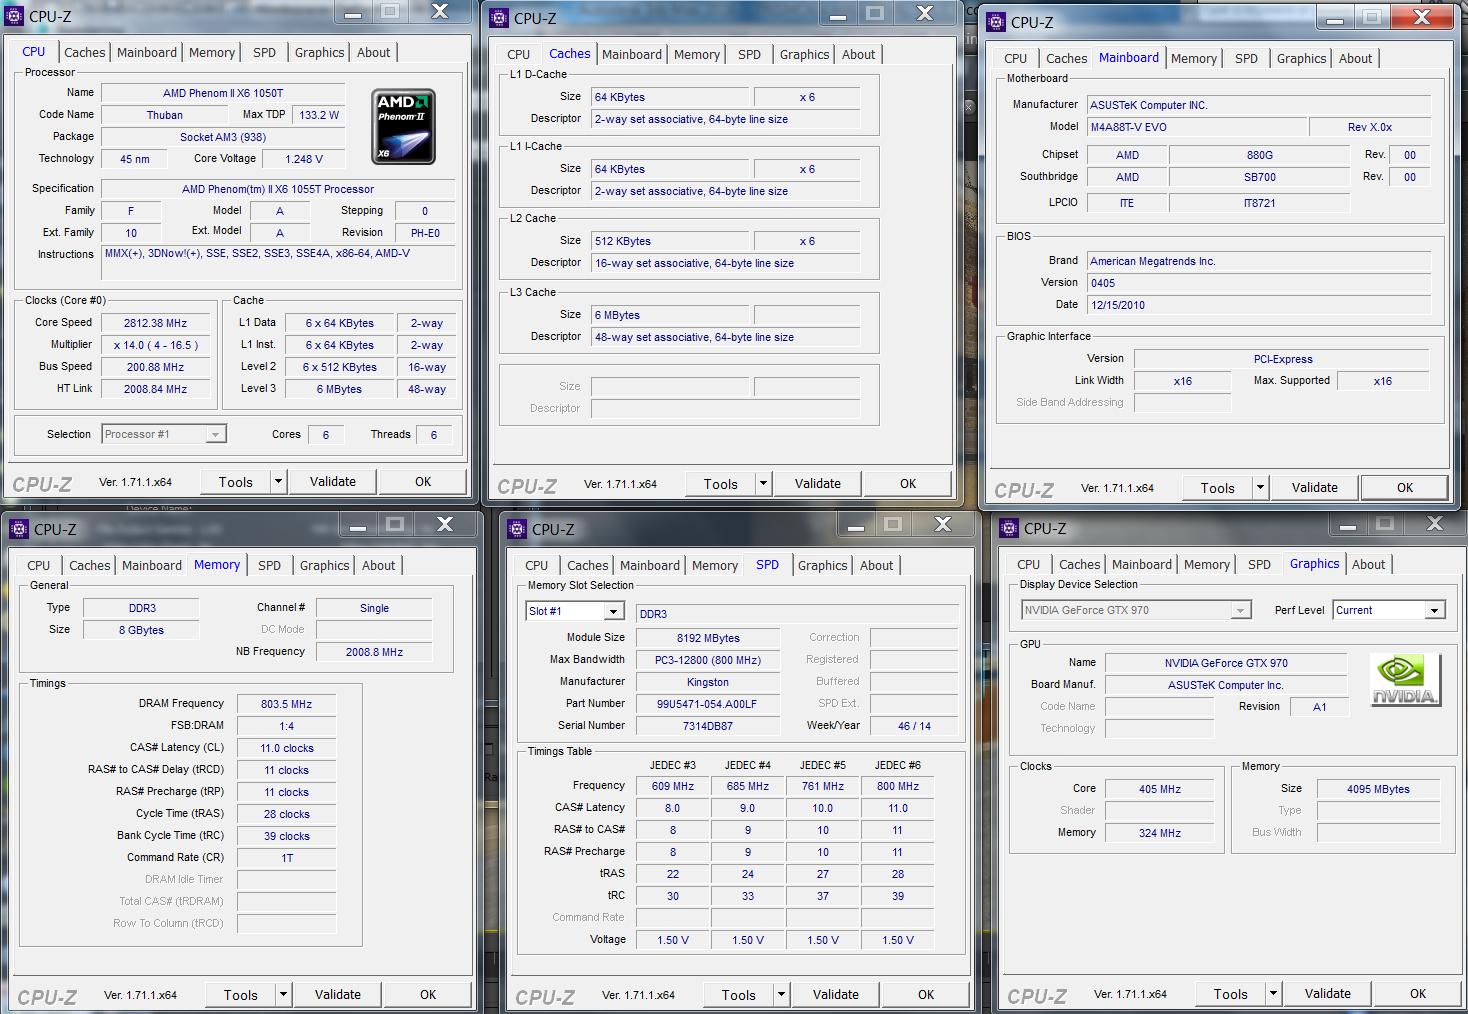 screenshot.946.png